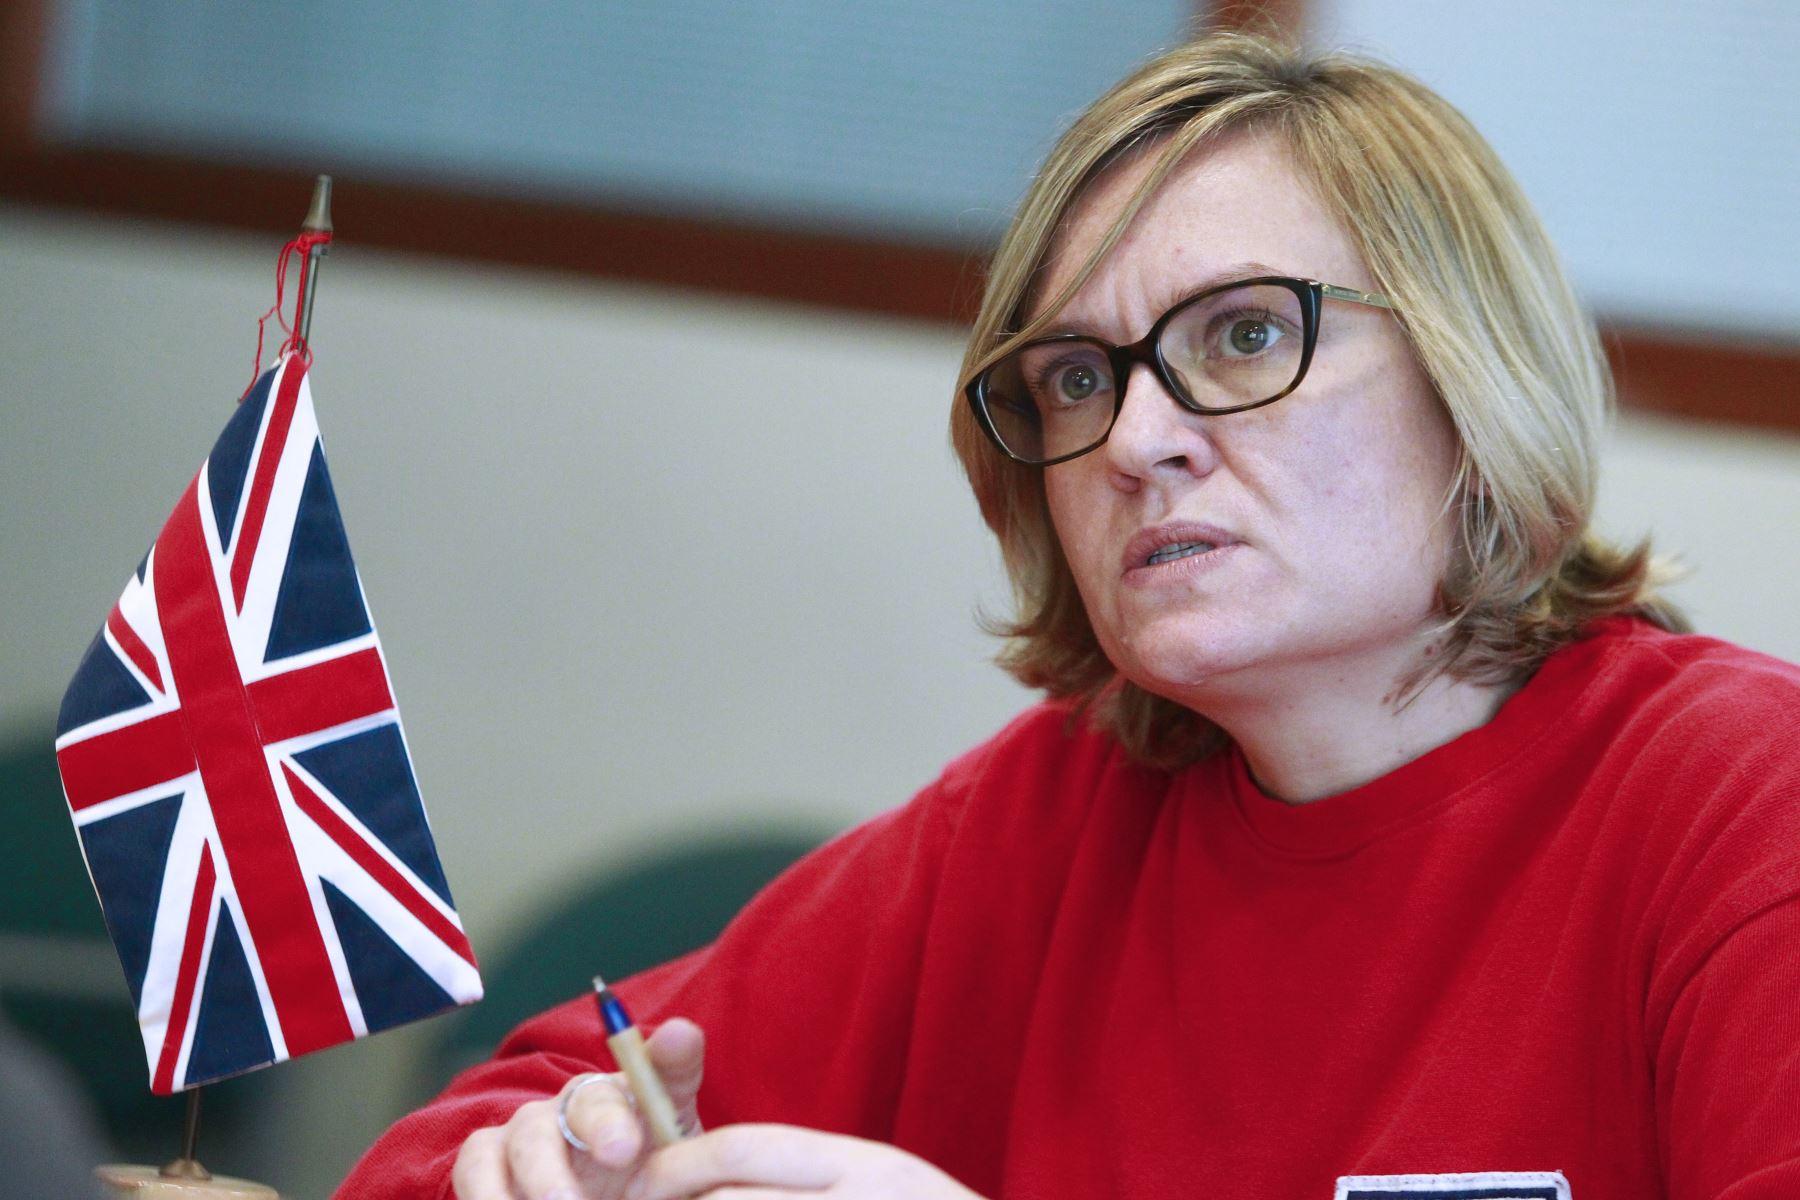 Embajadora Británica en Lima, Kate Harrison. ANDINA/Eddy Ramos